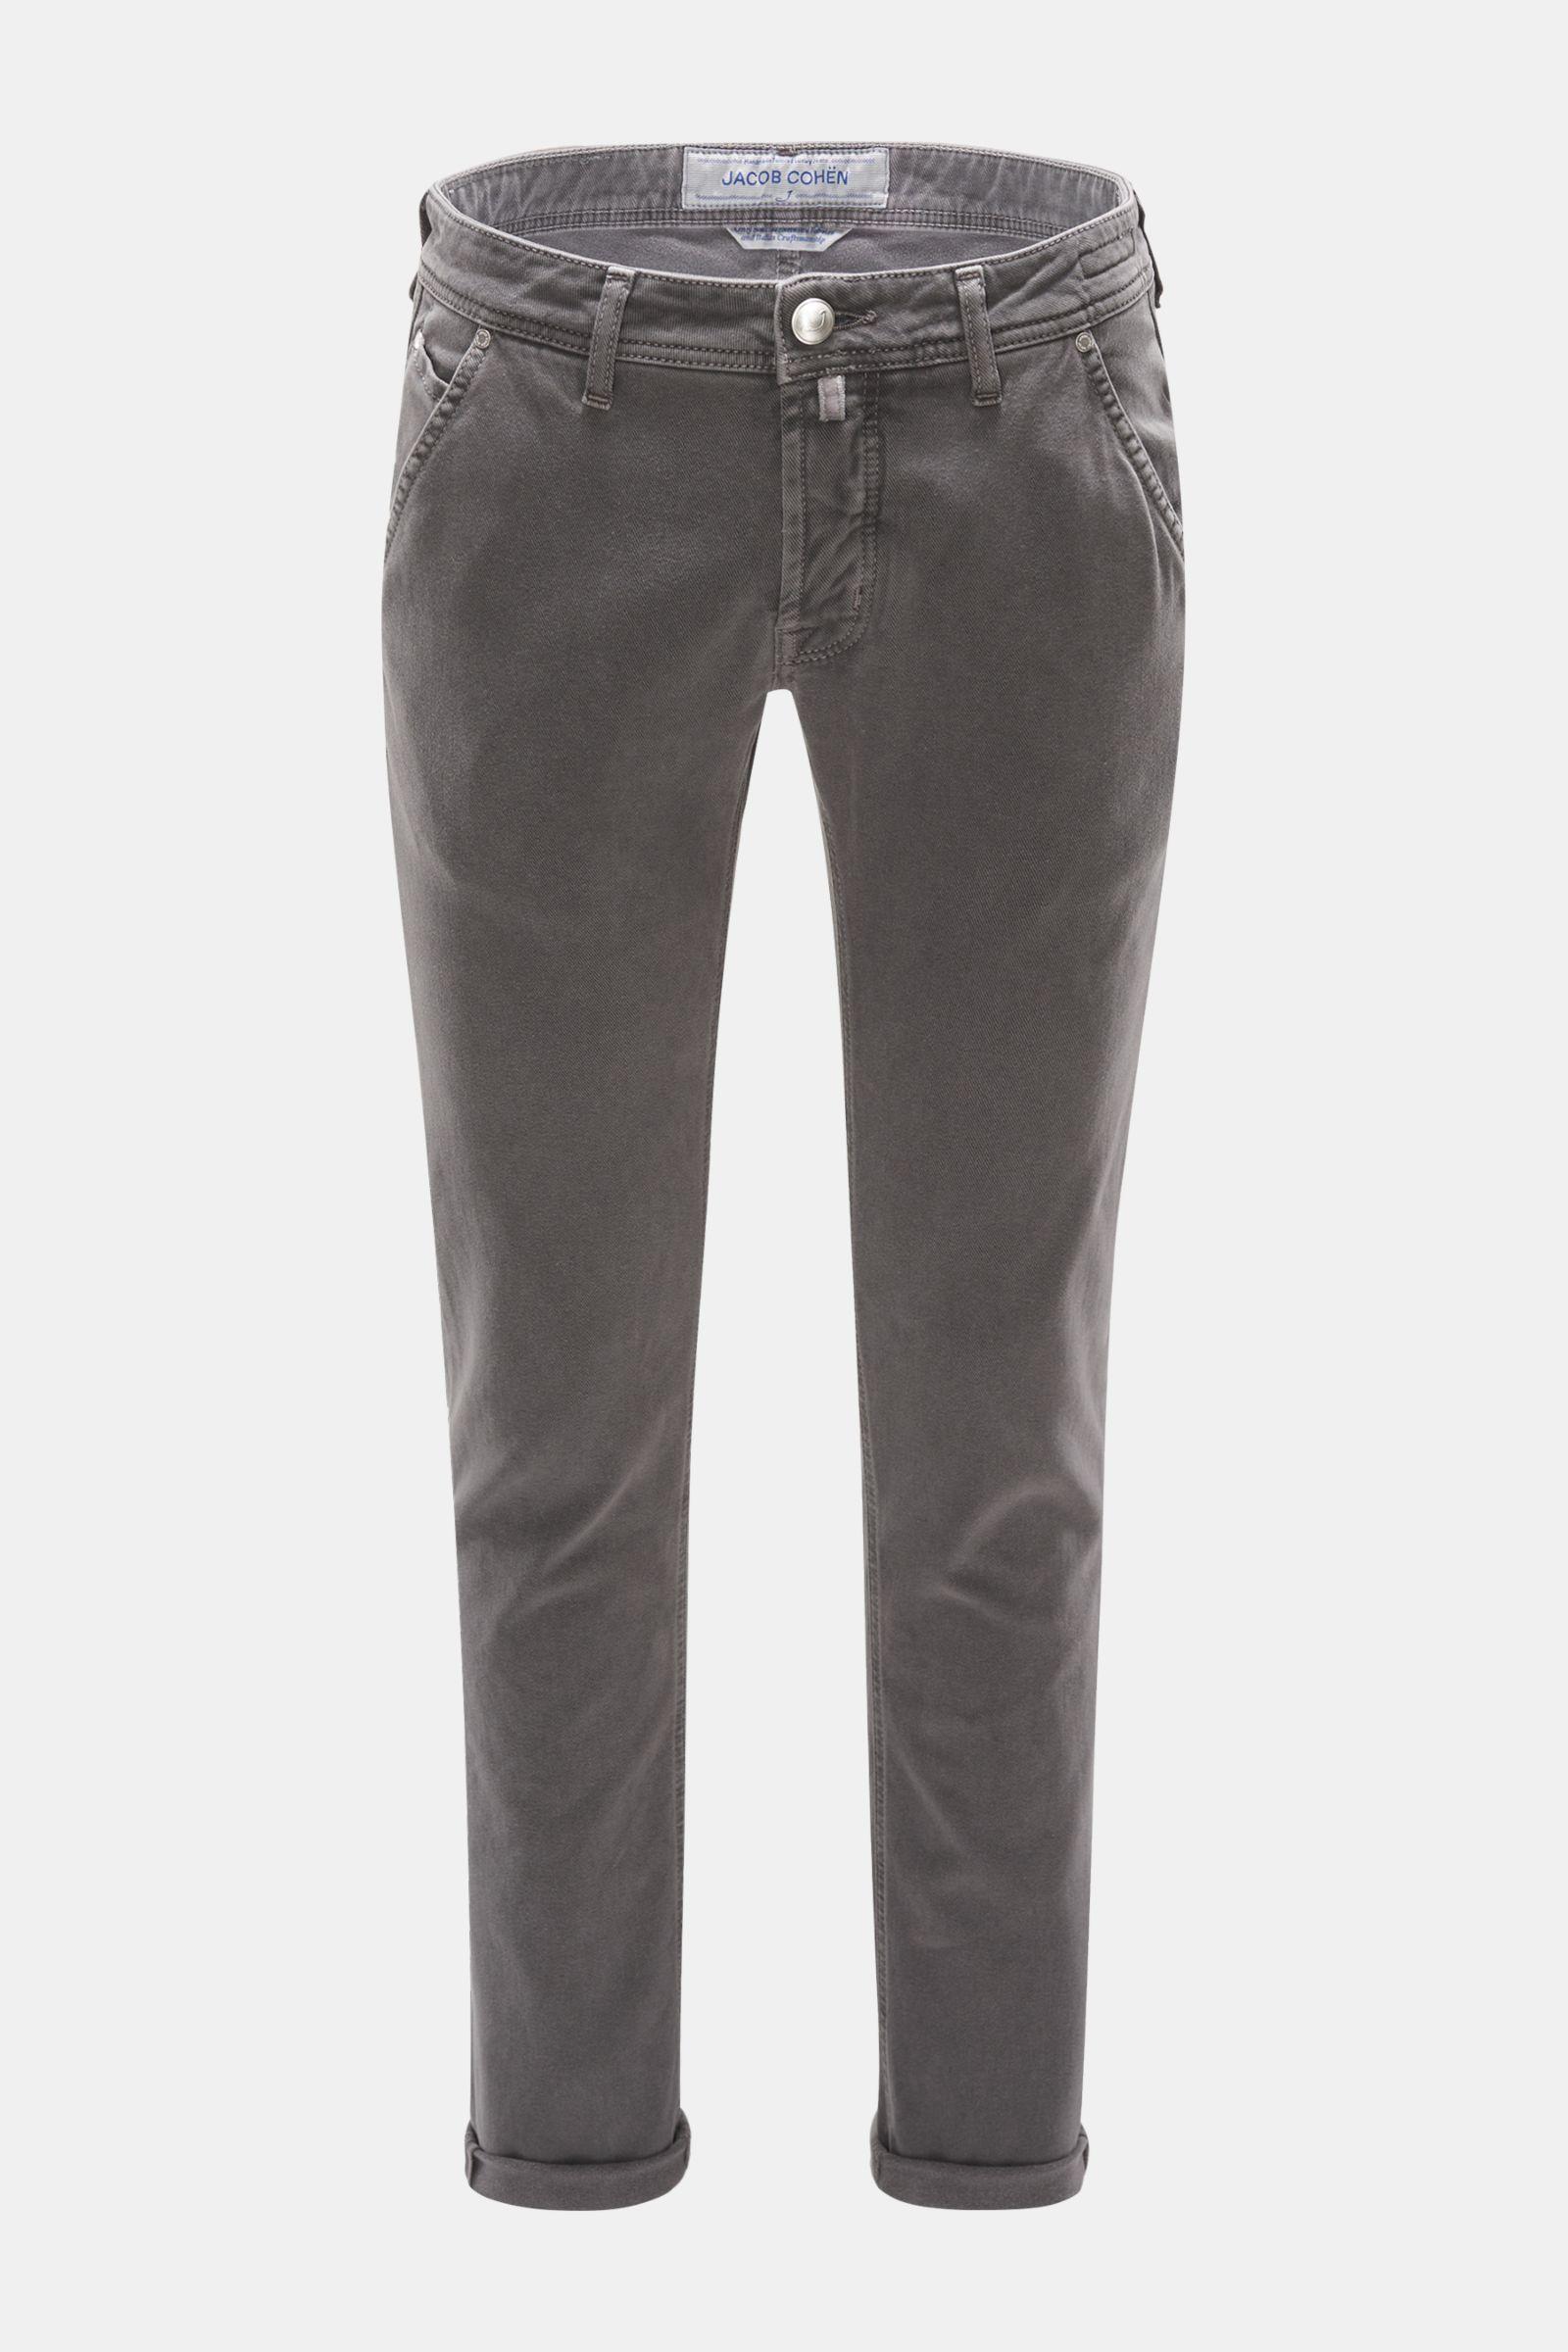 Baumwollhose 'J613 Comfort Vintage Slim Fit' grau